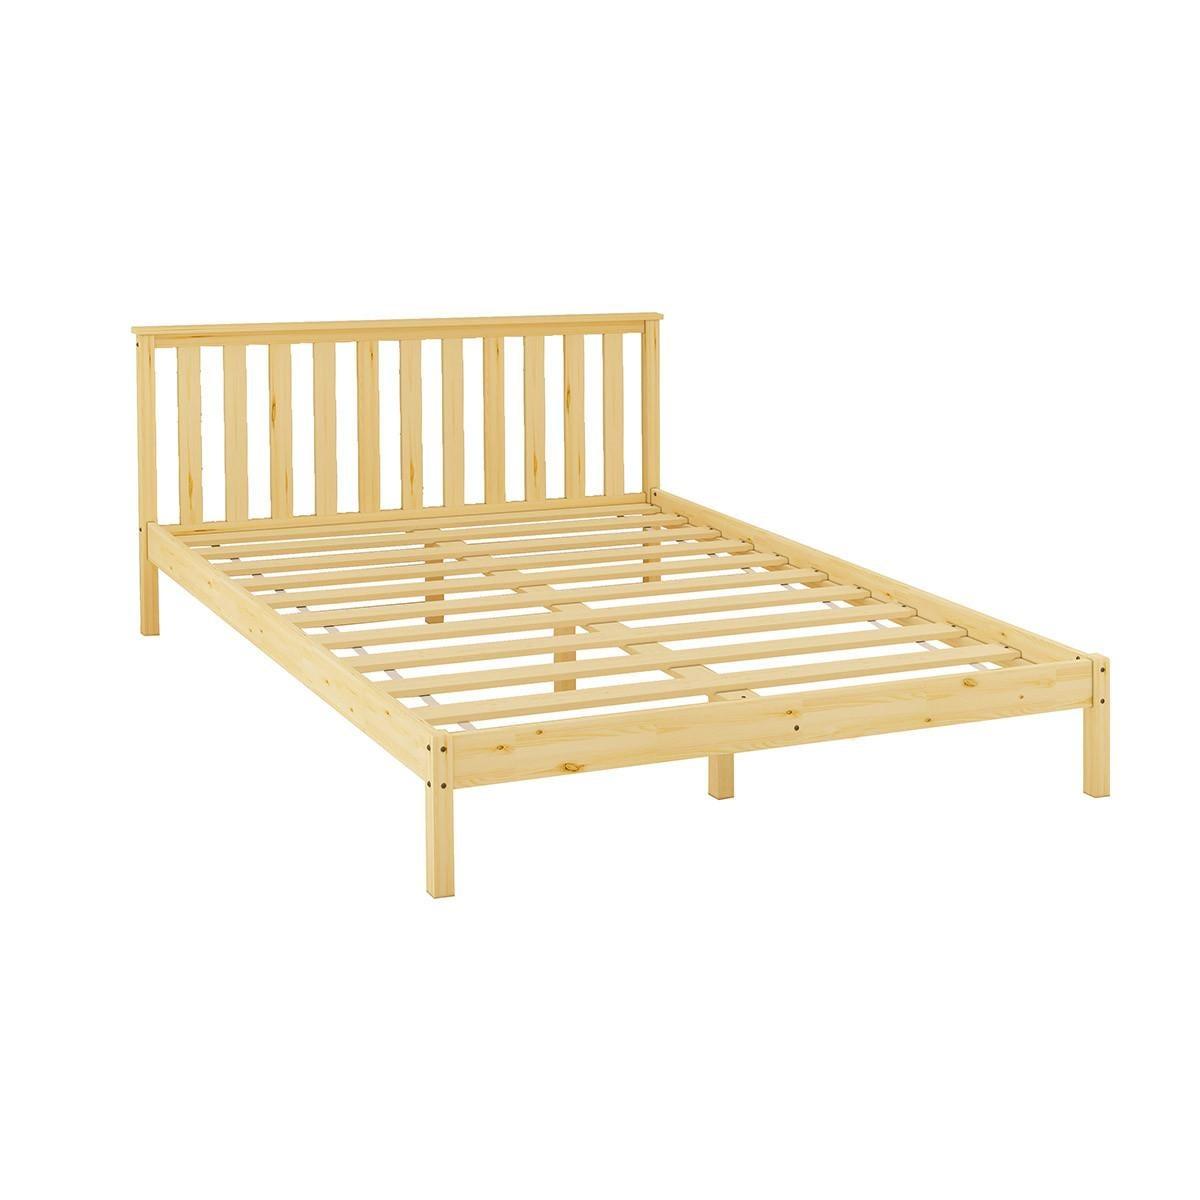 Wooden Bed Frame Queen Size Oak Platform Bed Base Bedroom Furniture Matt Blatt